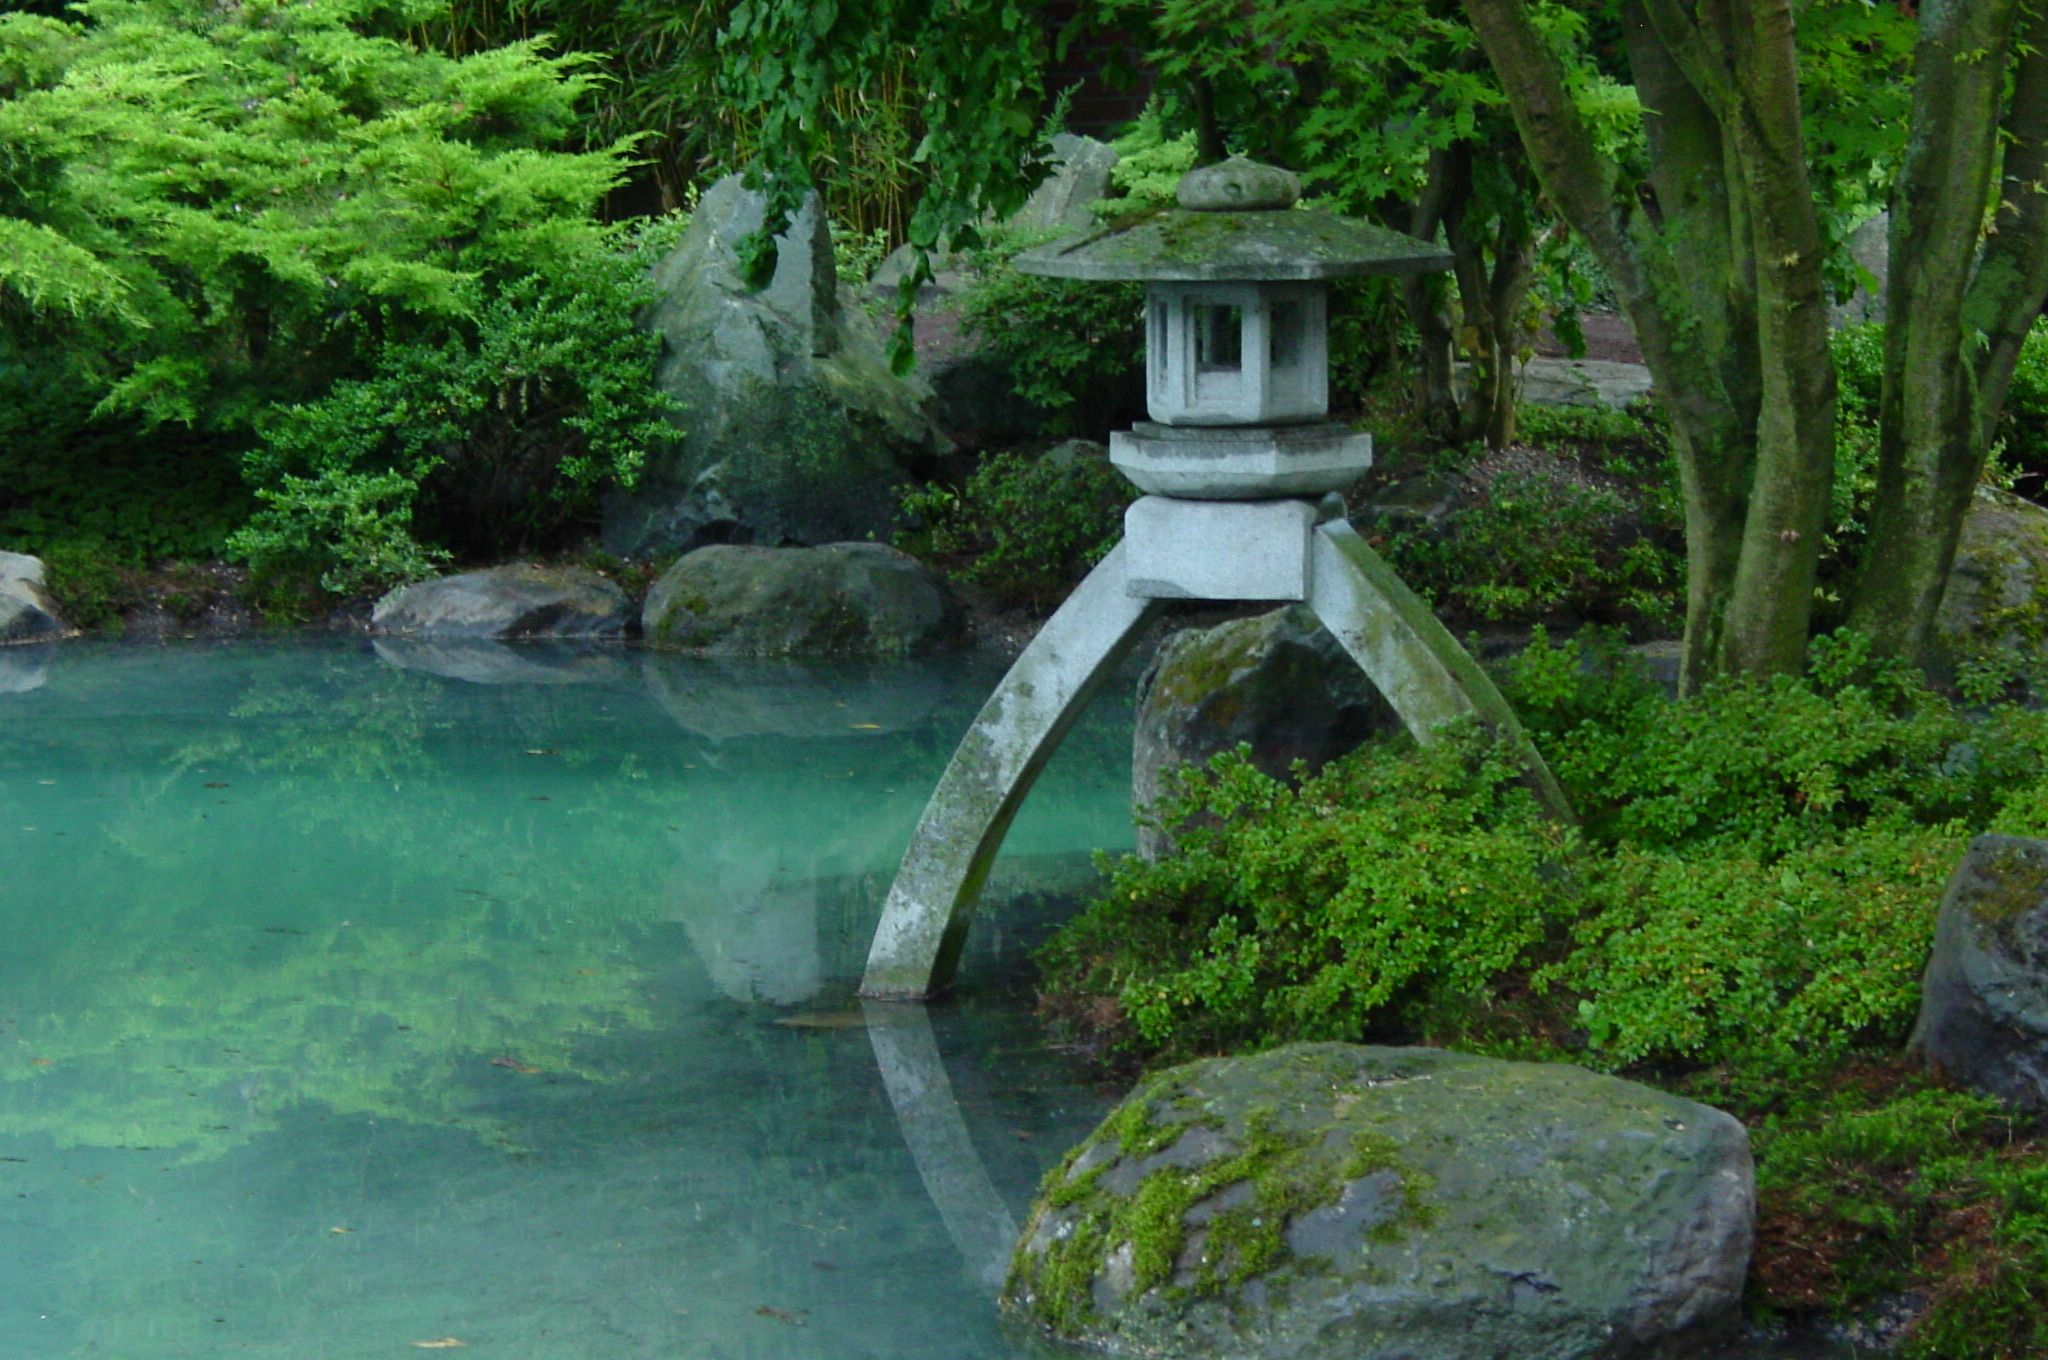 Gartendesign Von Japan Garten Kultur Japanischer Garten Zen Garten Asia Garten